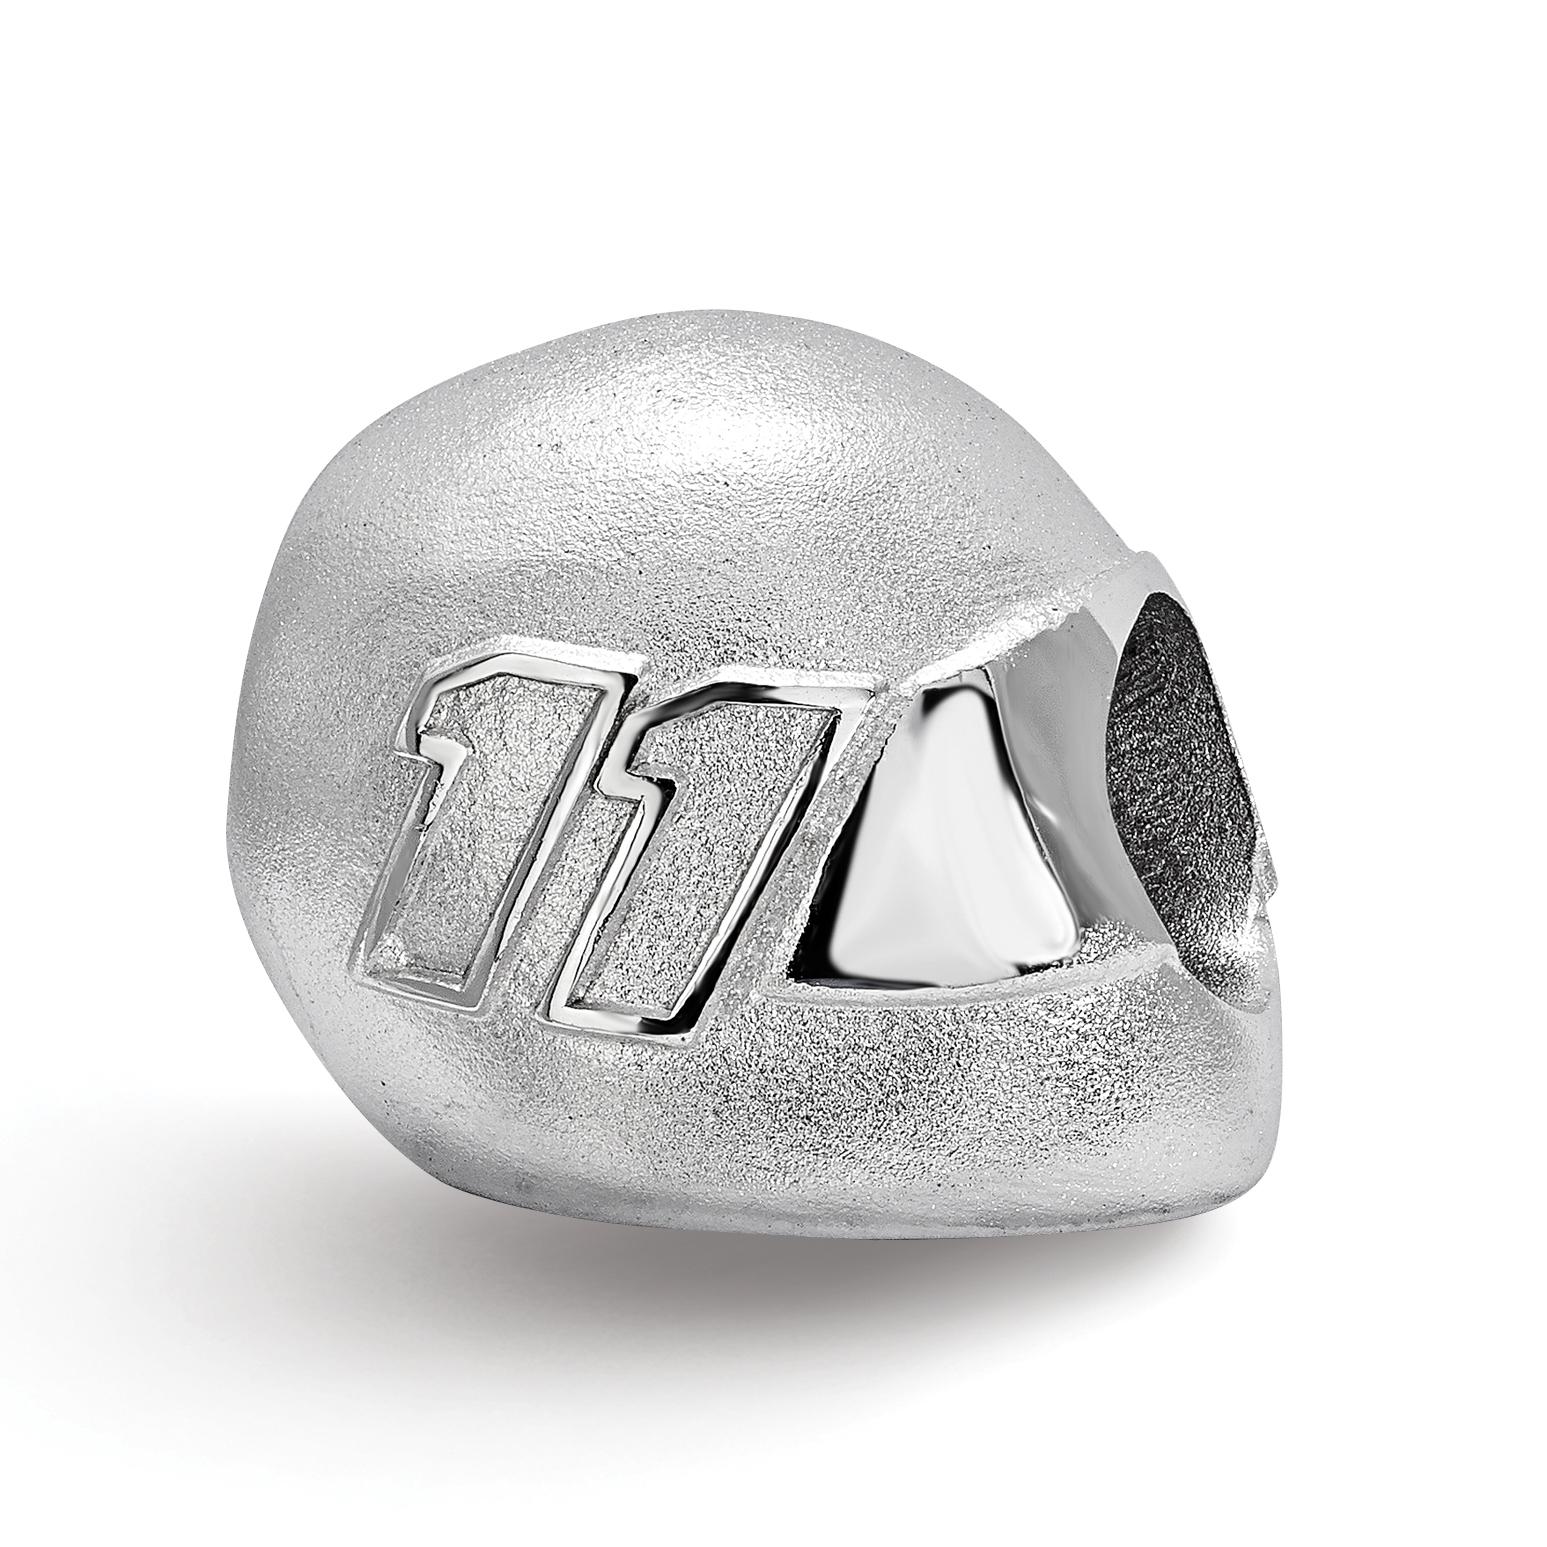 11 x 11 mm Reflection Beads Sterling Silver Black Enamel Bead